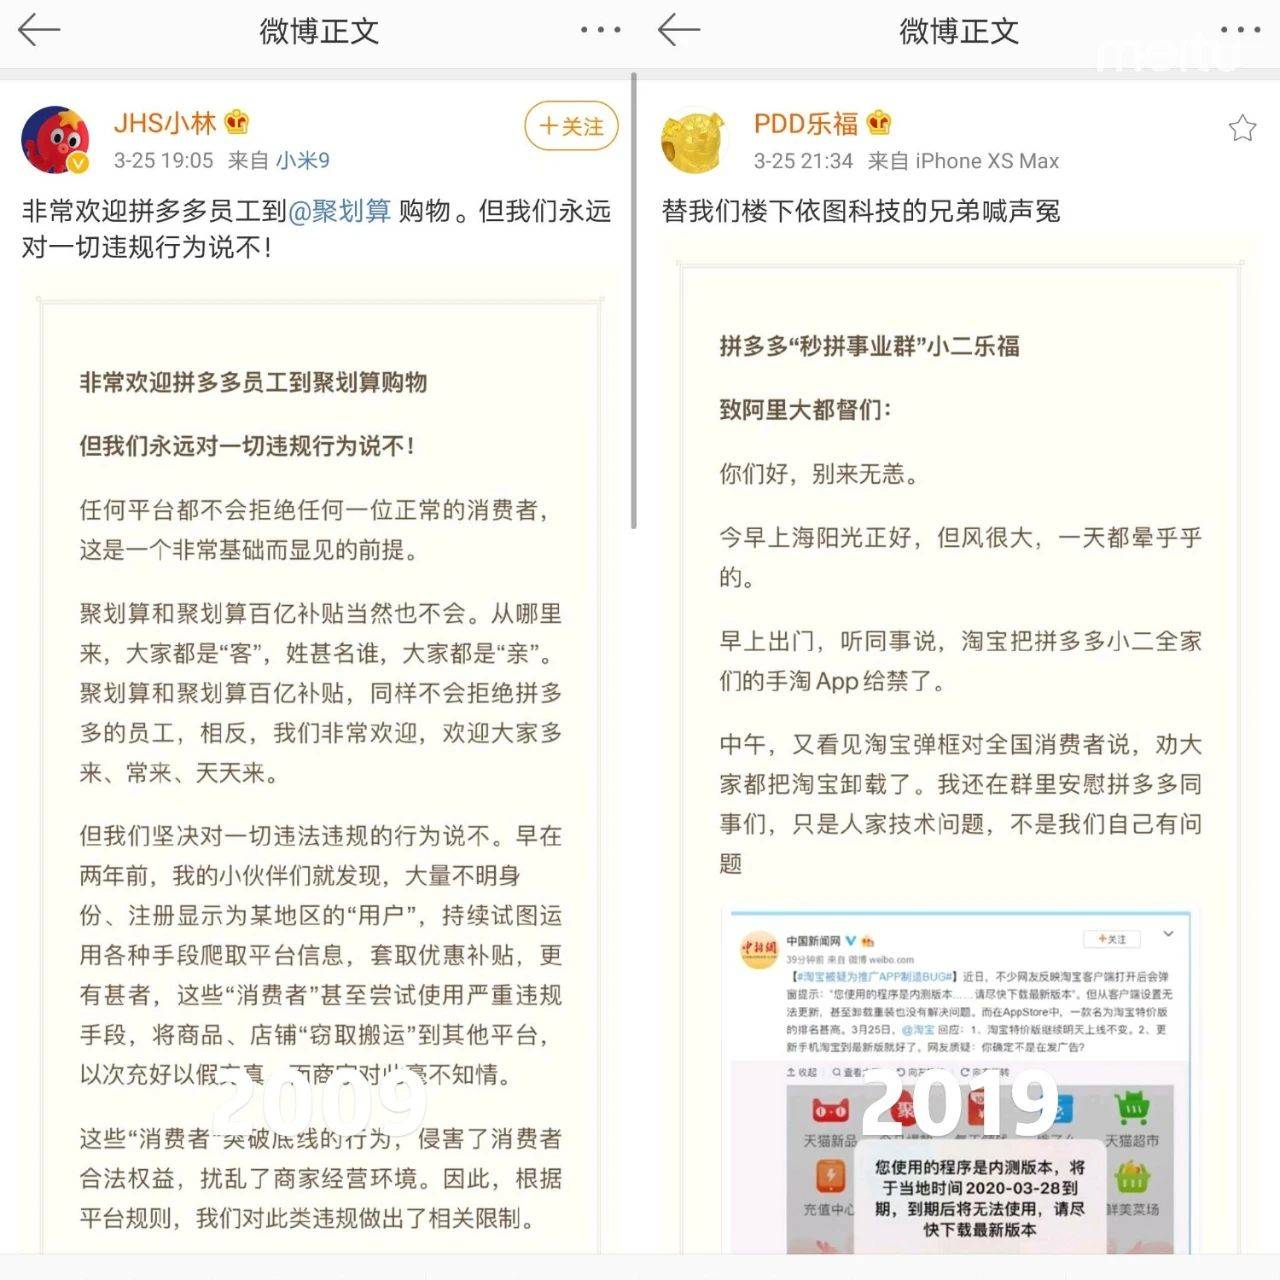 淘yuan)Α?炊duo)多(duo)互撕,下沉市場(chang)爭奪(duo)戰(zhan)升級(ji)